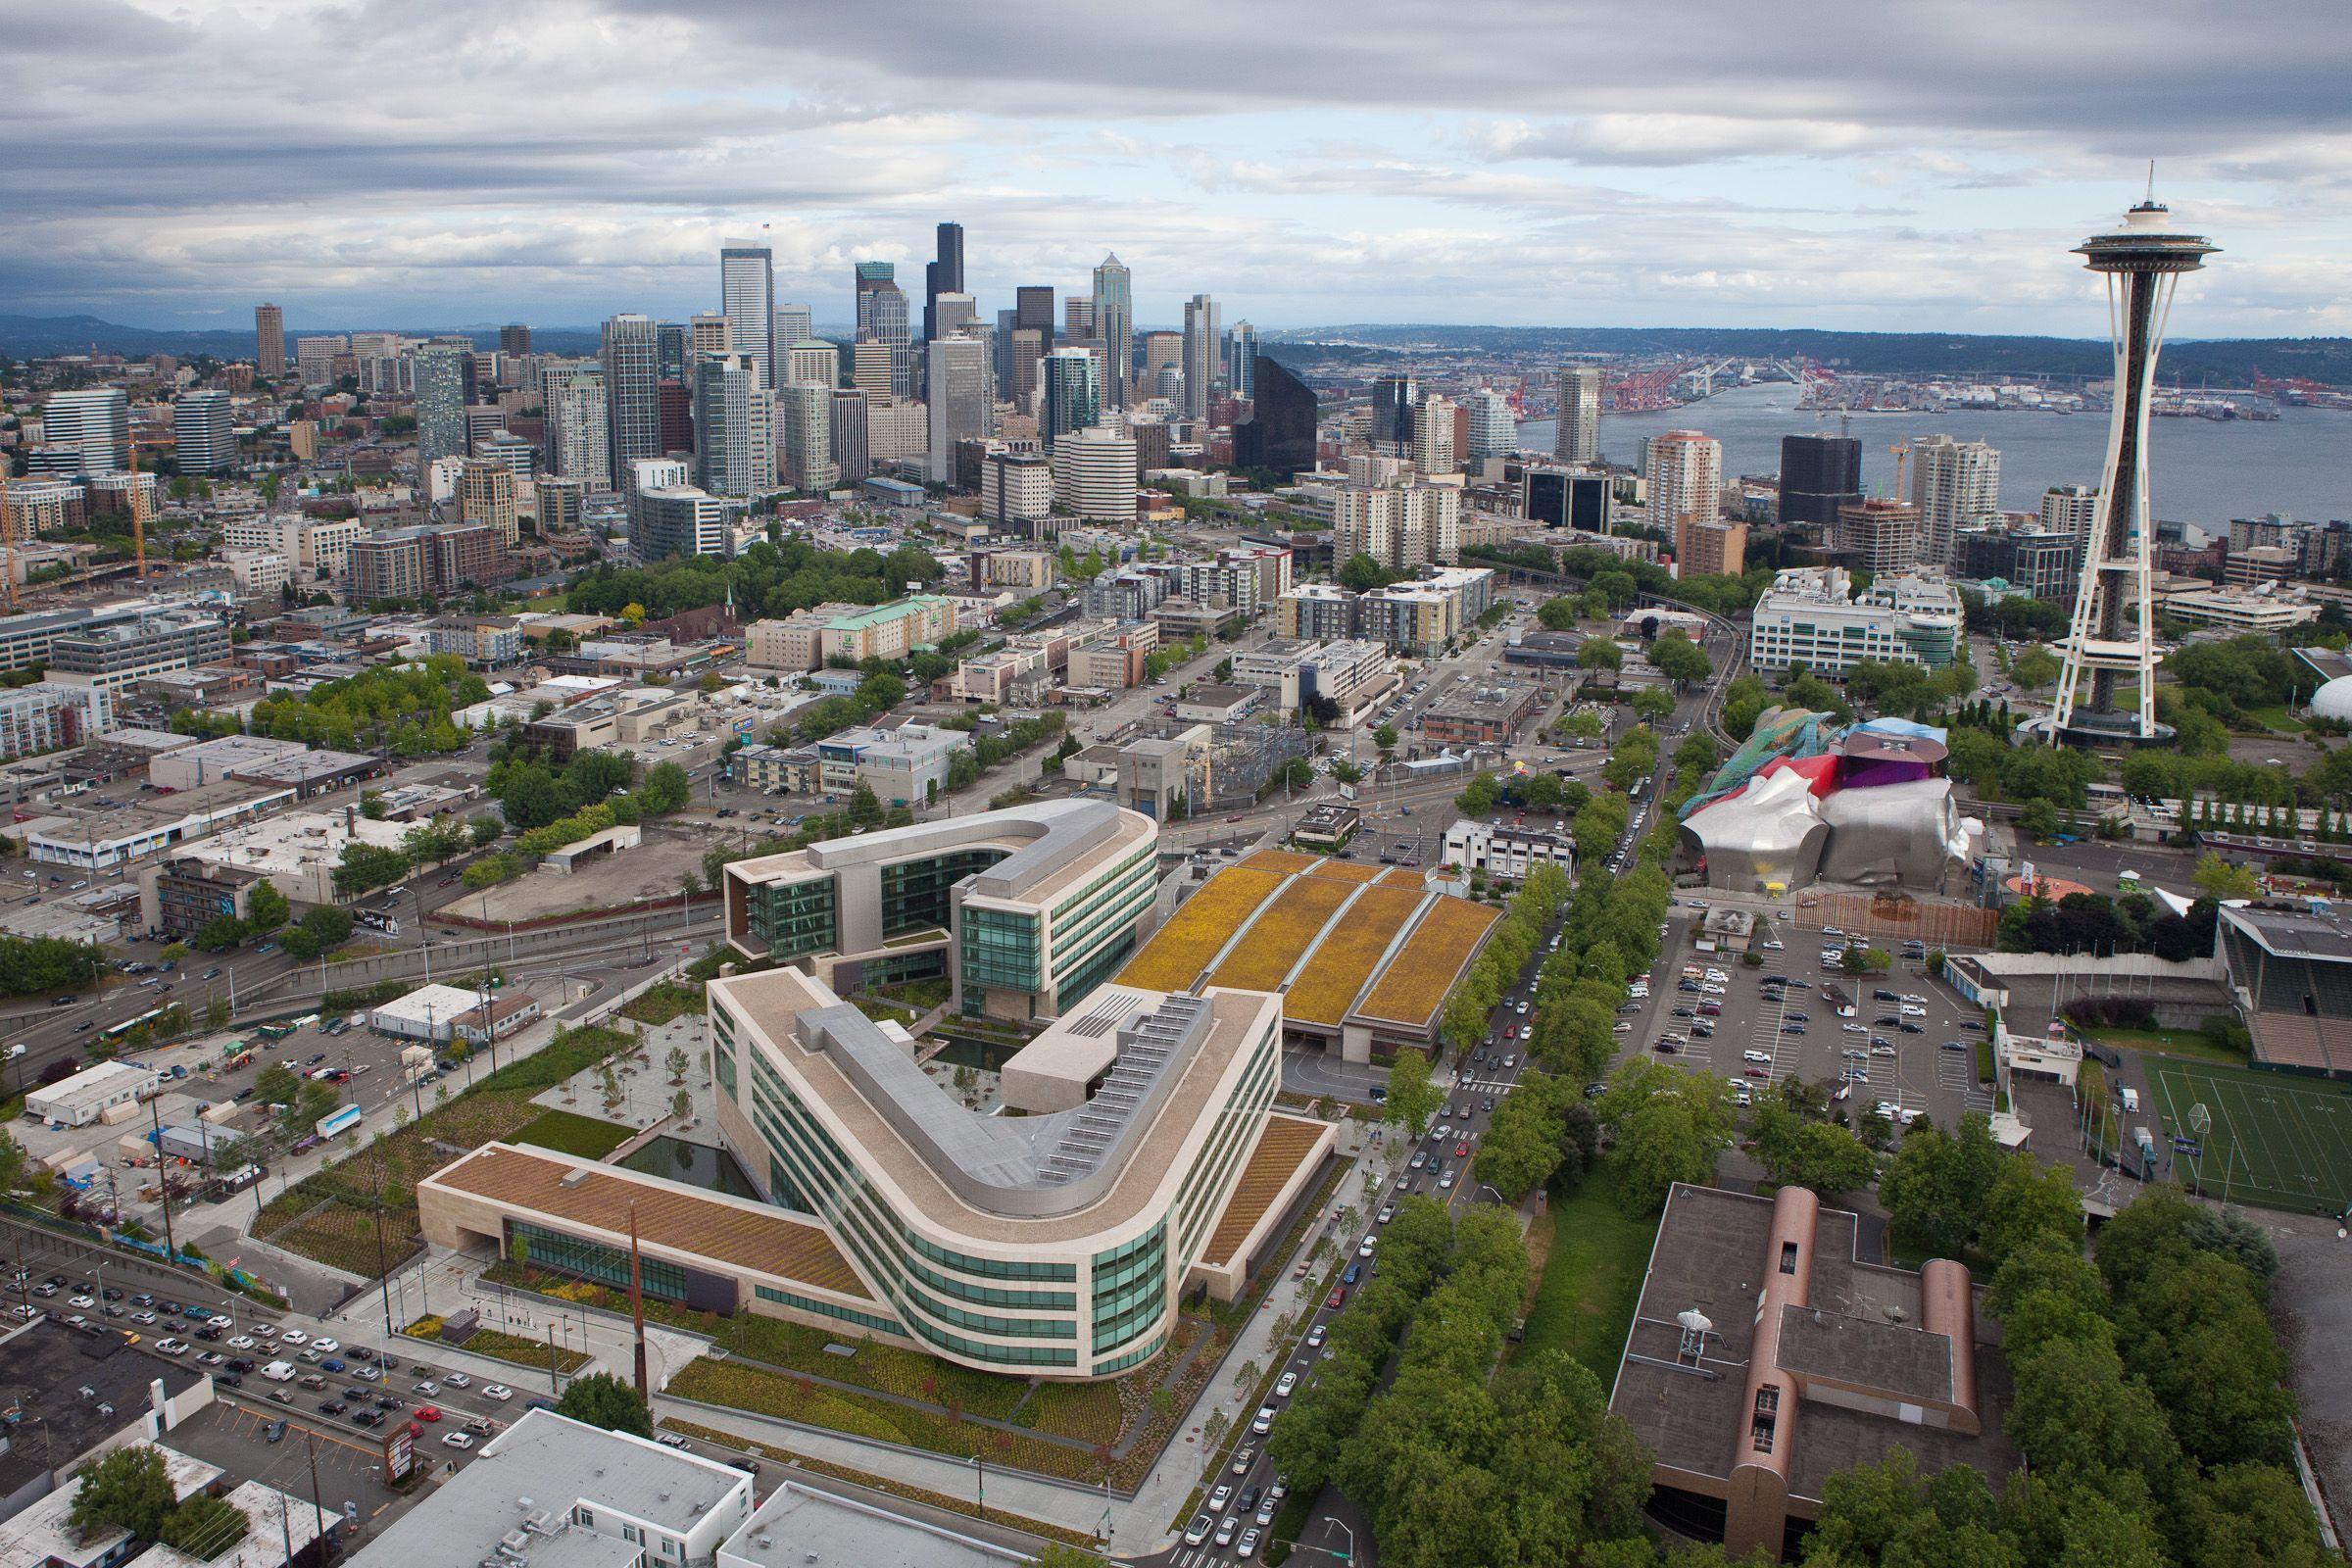 Bill Amp Melinda Gates Foundation Amp Seattle Center 5th